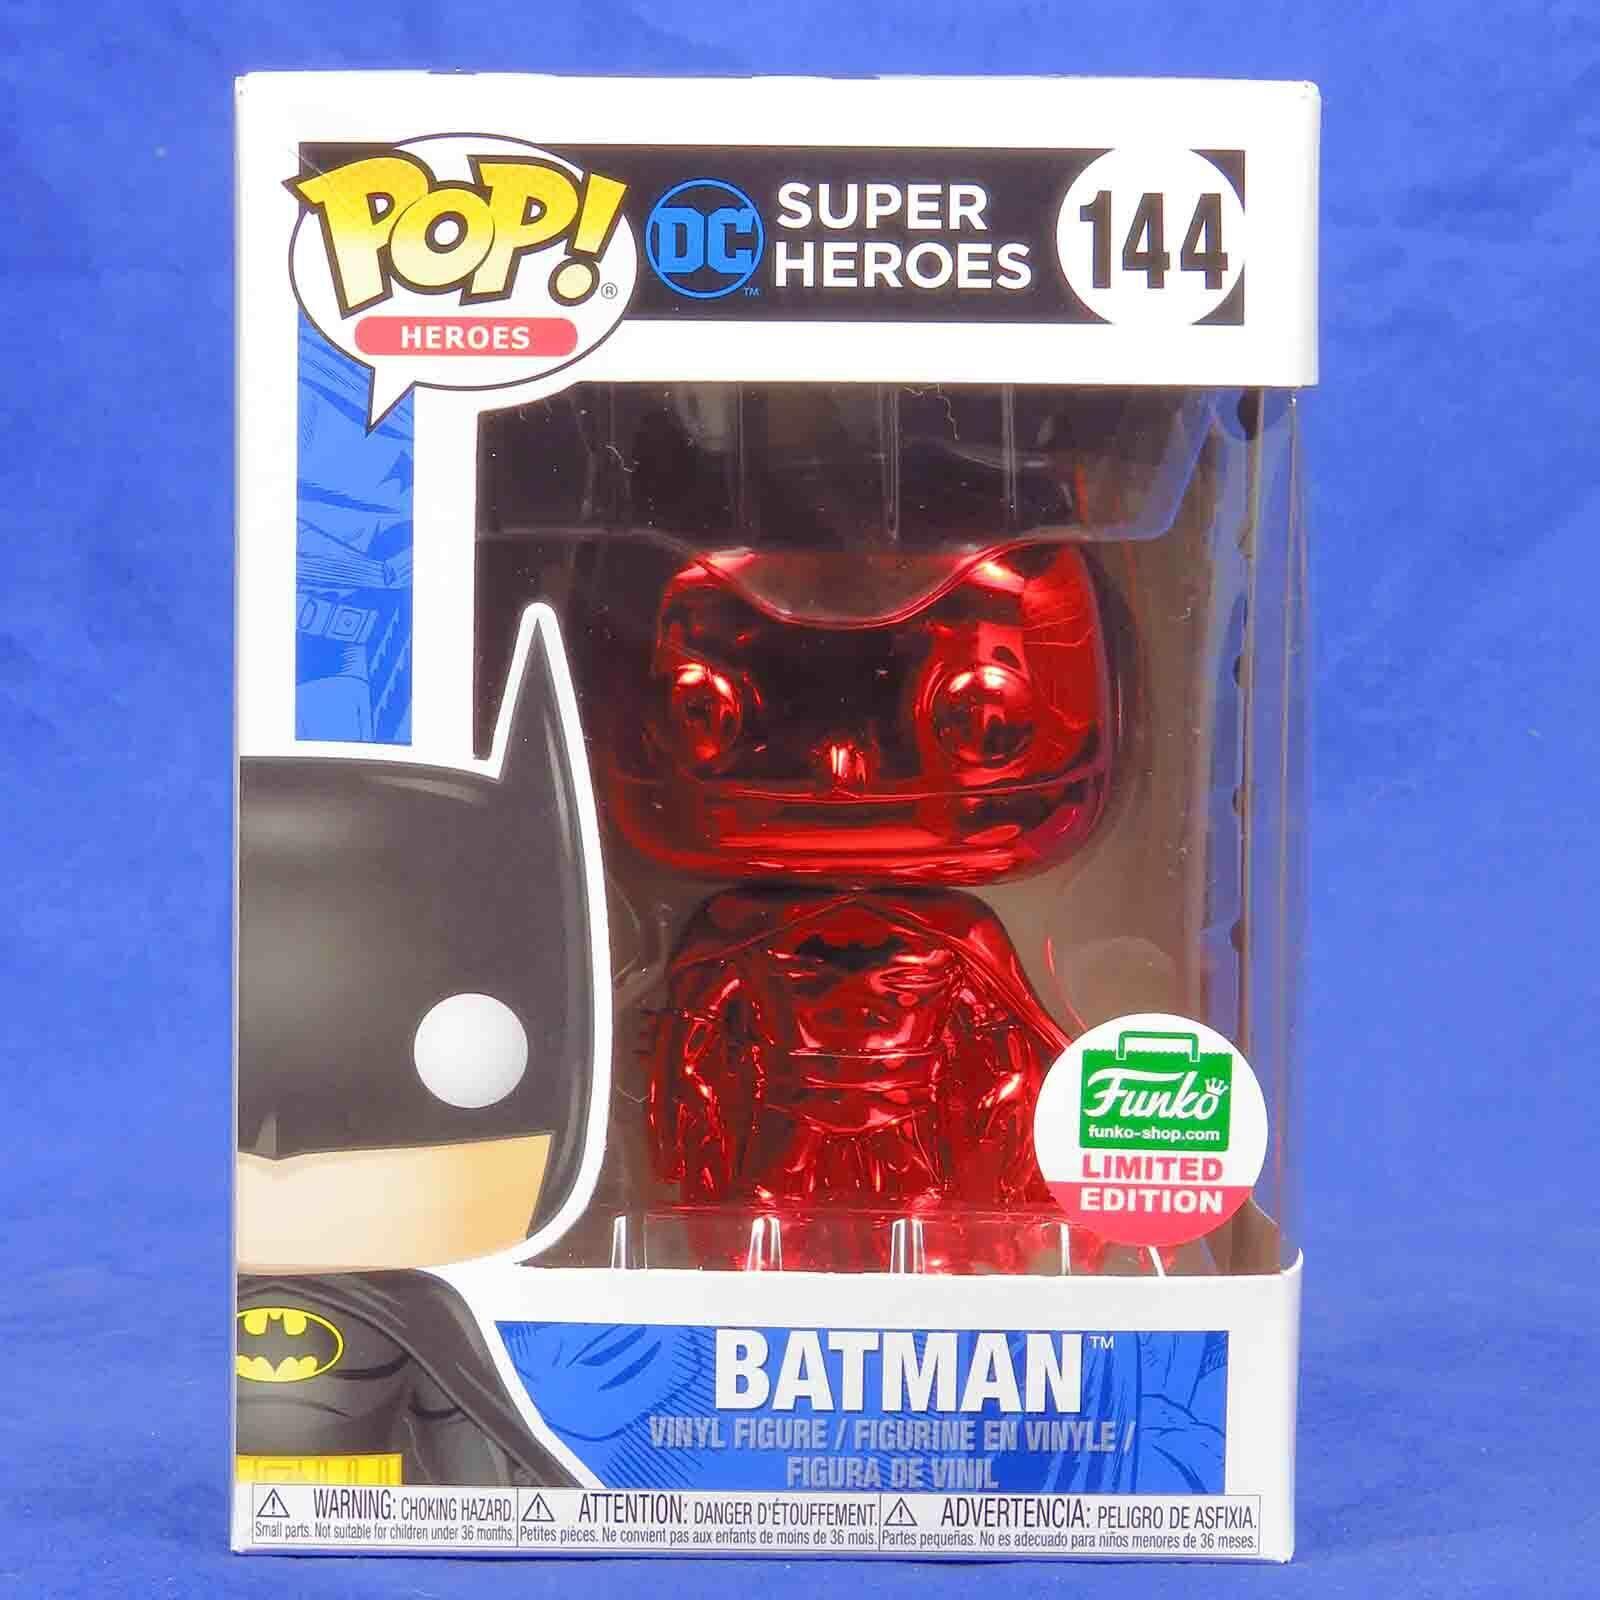 Funko Pop Vinilo figura Héroes DC súper Heroes  144 Batman Roja Cromo